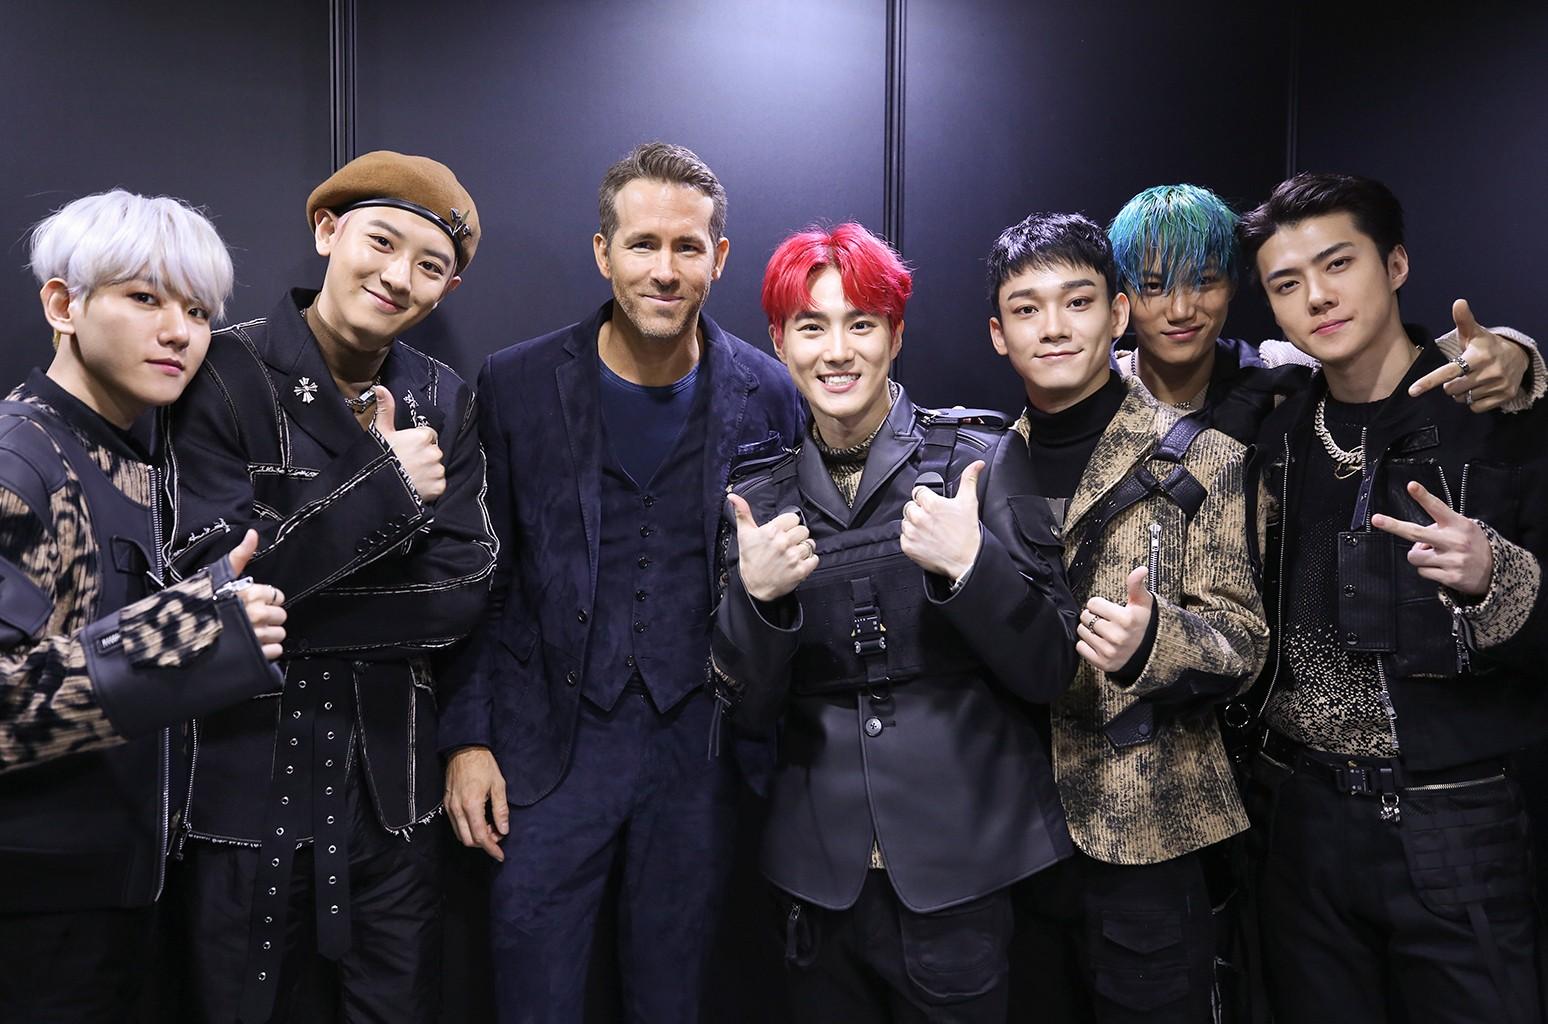 EXO Members and Ryan Reynolds